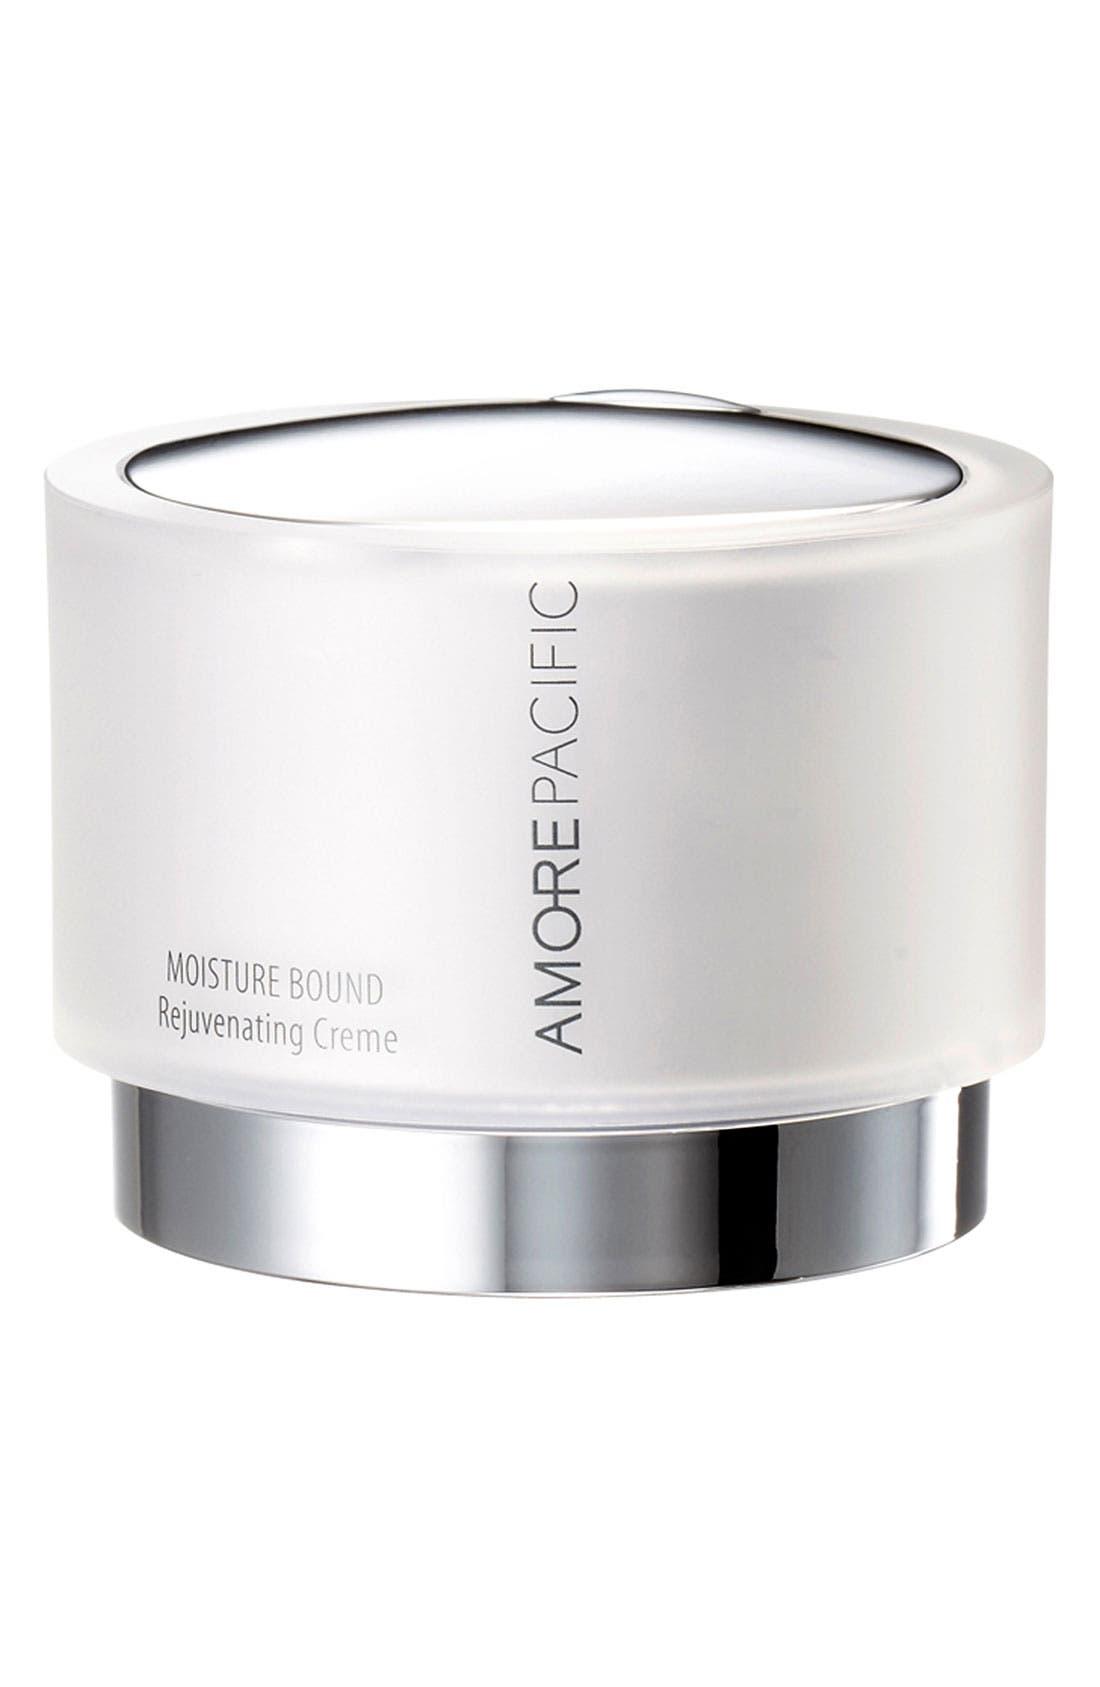 AMOREPACIFIC 'Moisture Bound' Rejuvenating Crème